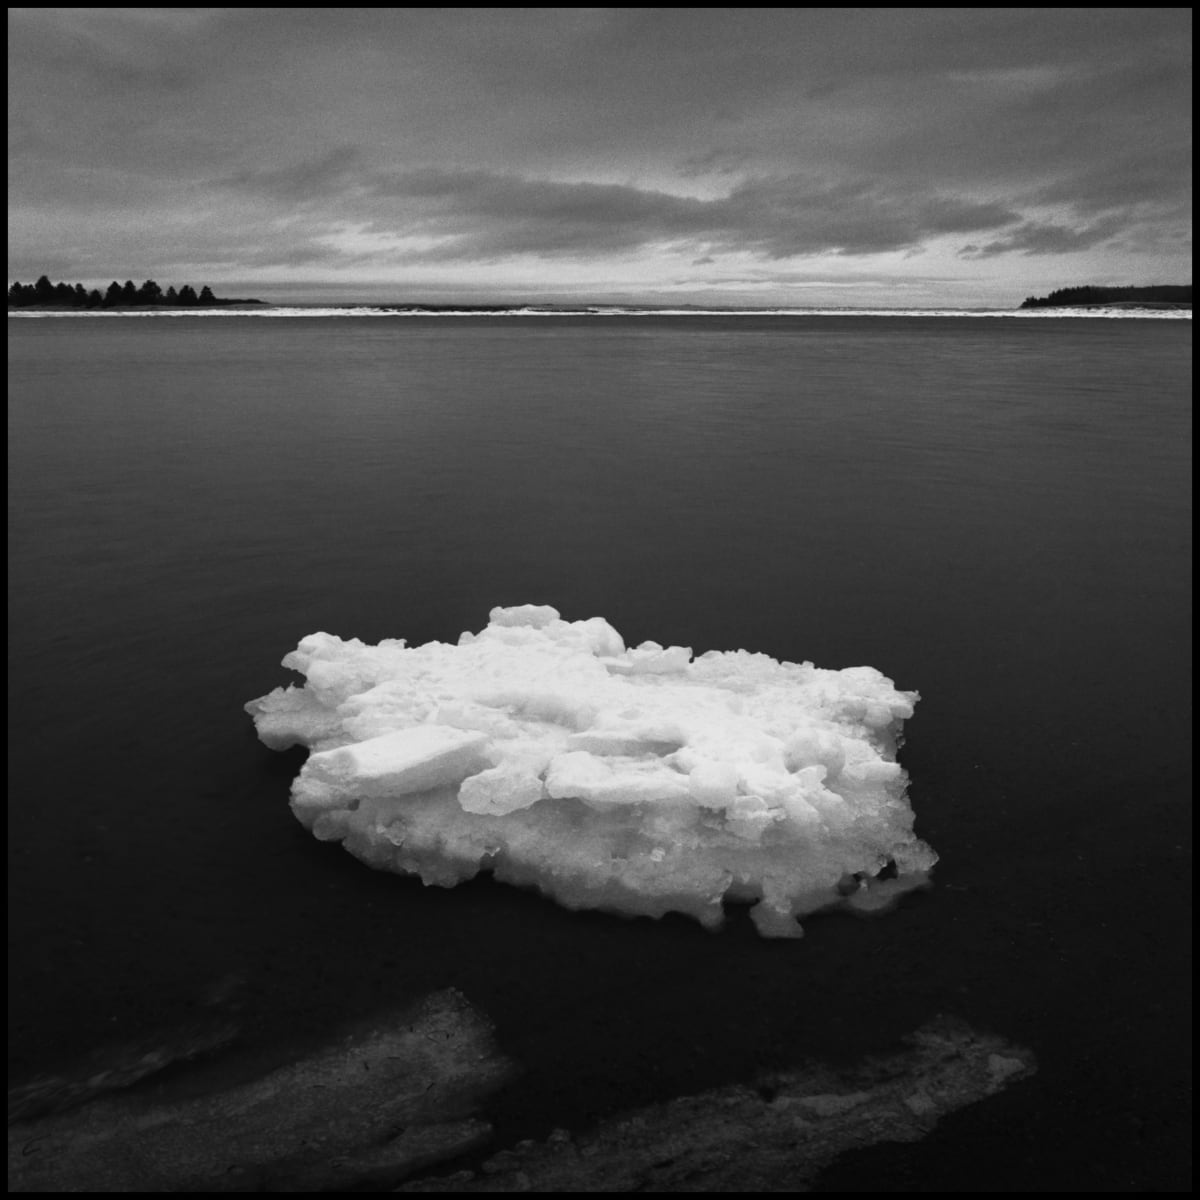 Ice, Northumberland Strait, Nova Scotia